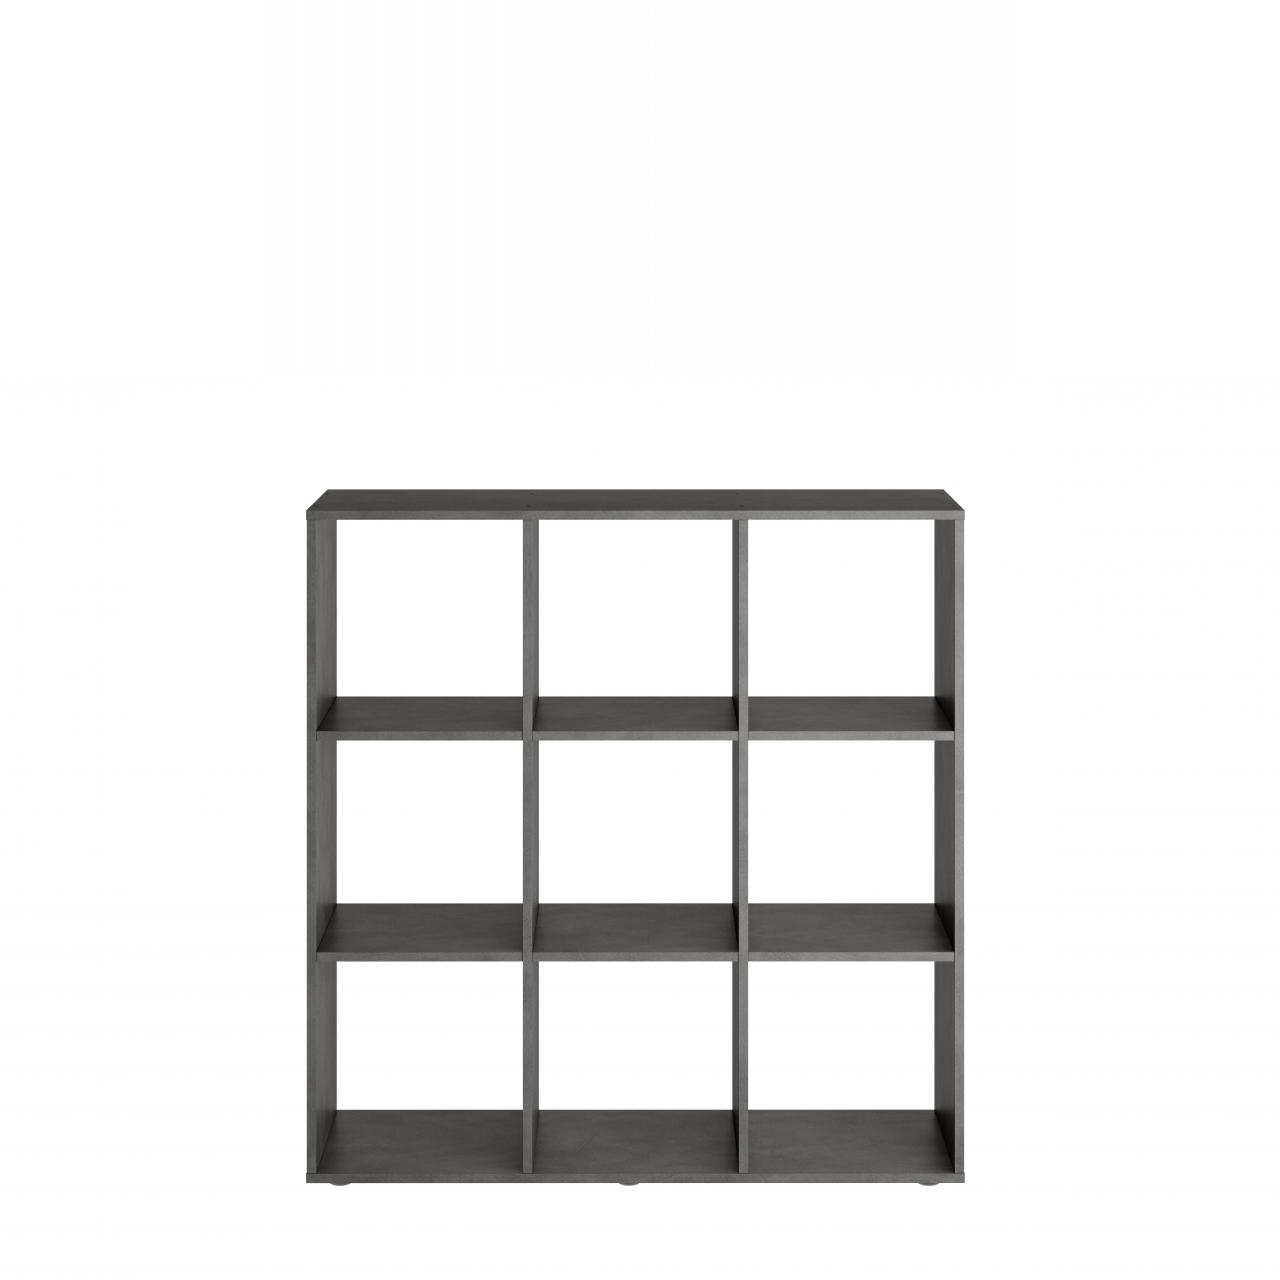 Standregal Bücherregal Mega 5 248-005 Matera 9 Fächer Fächerregal Raumteiler